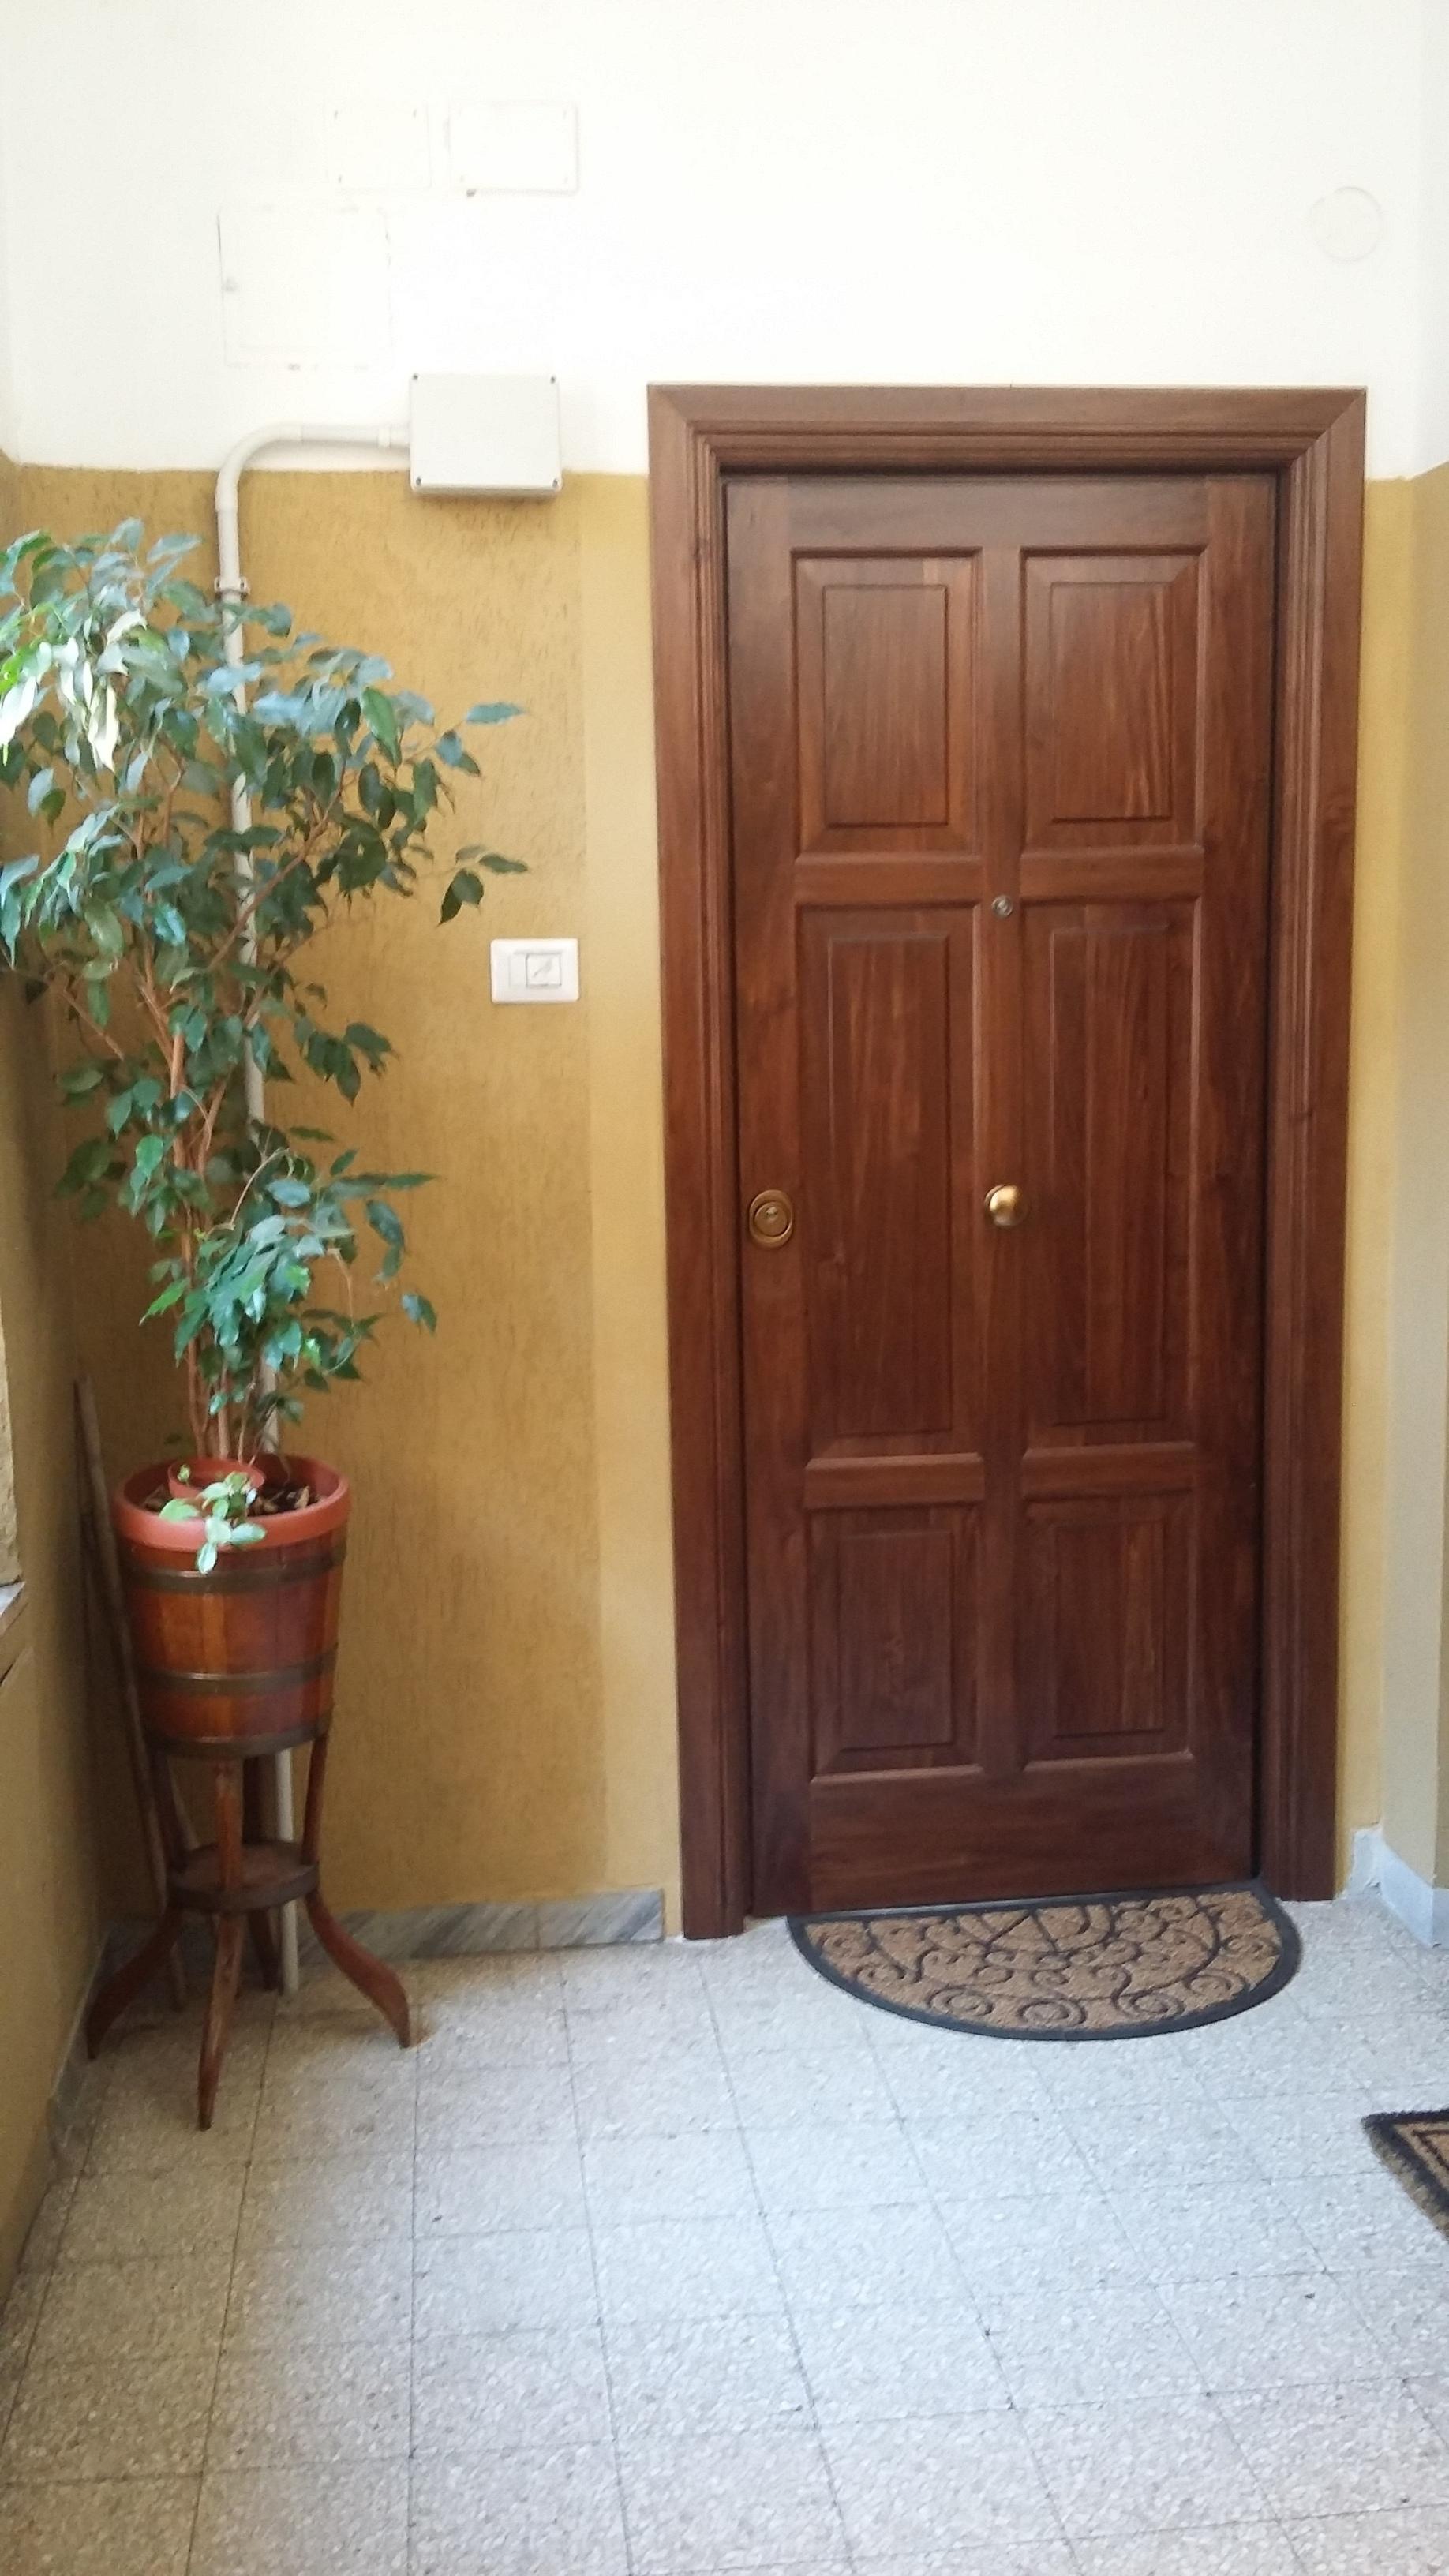 Salle De Bain Giovanni ~ ancient rome summer 2018 closed home exchange